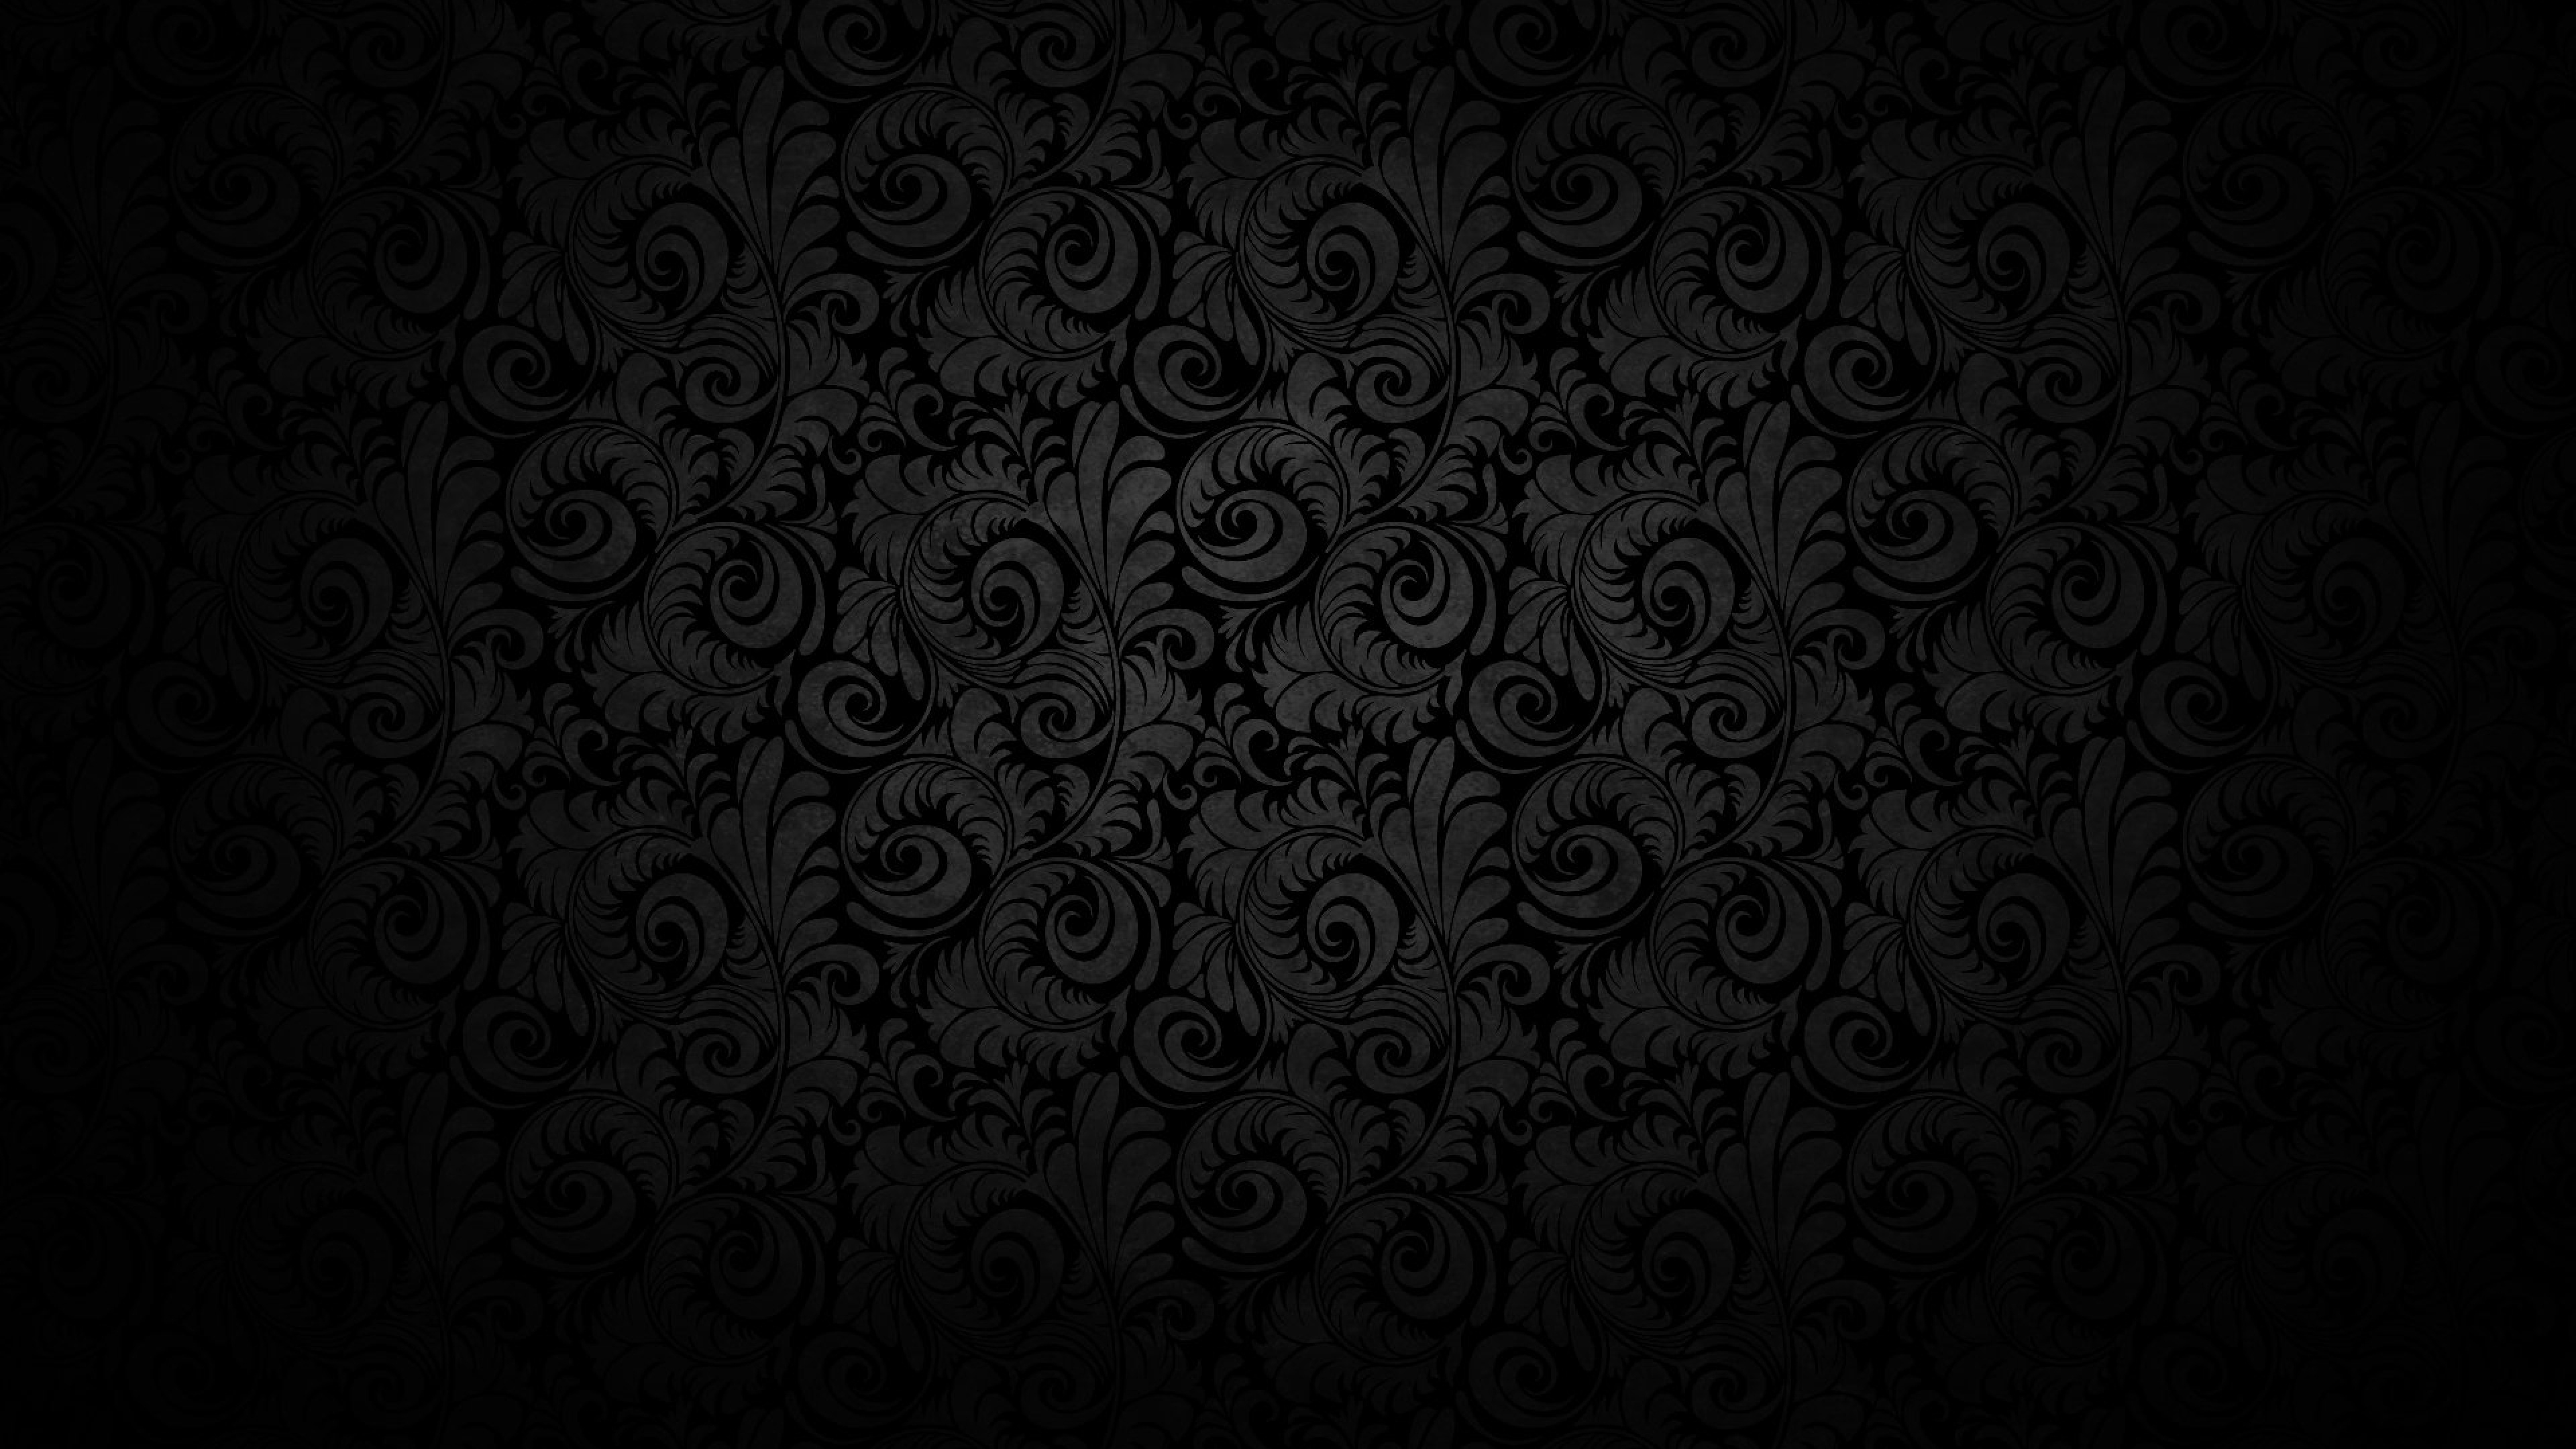 Black background Pattern Light Texture Wallpaper Background 4K 3840x2160